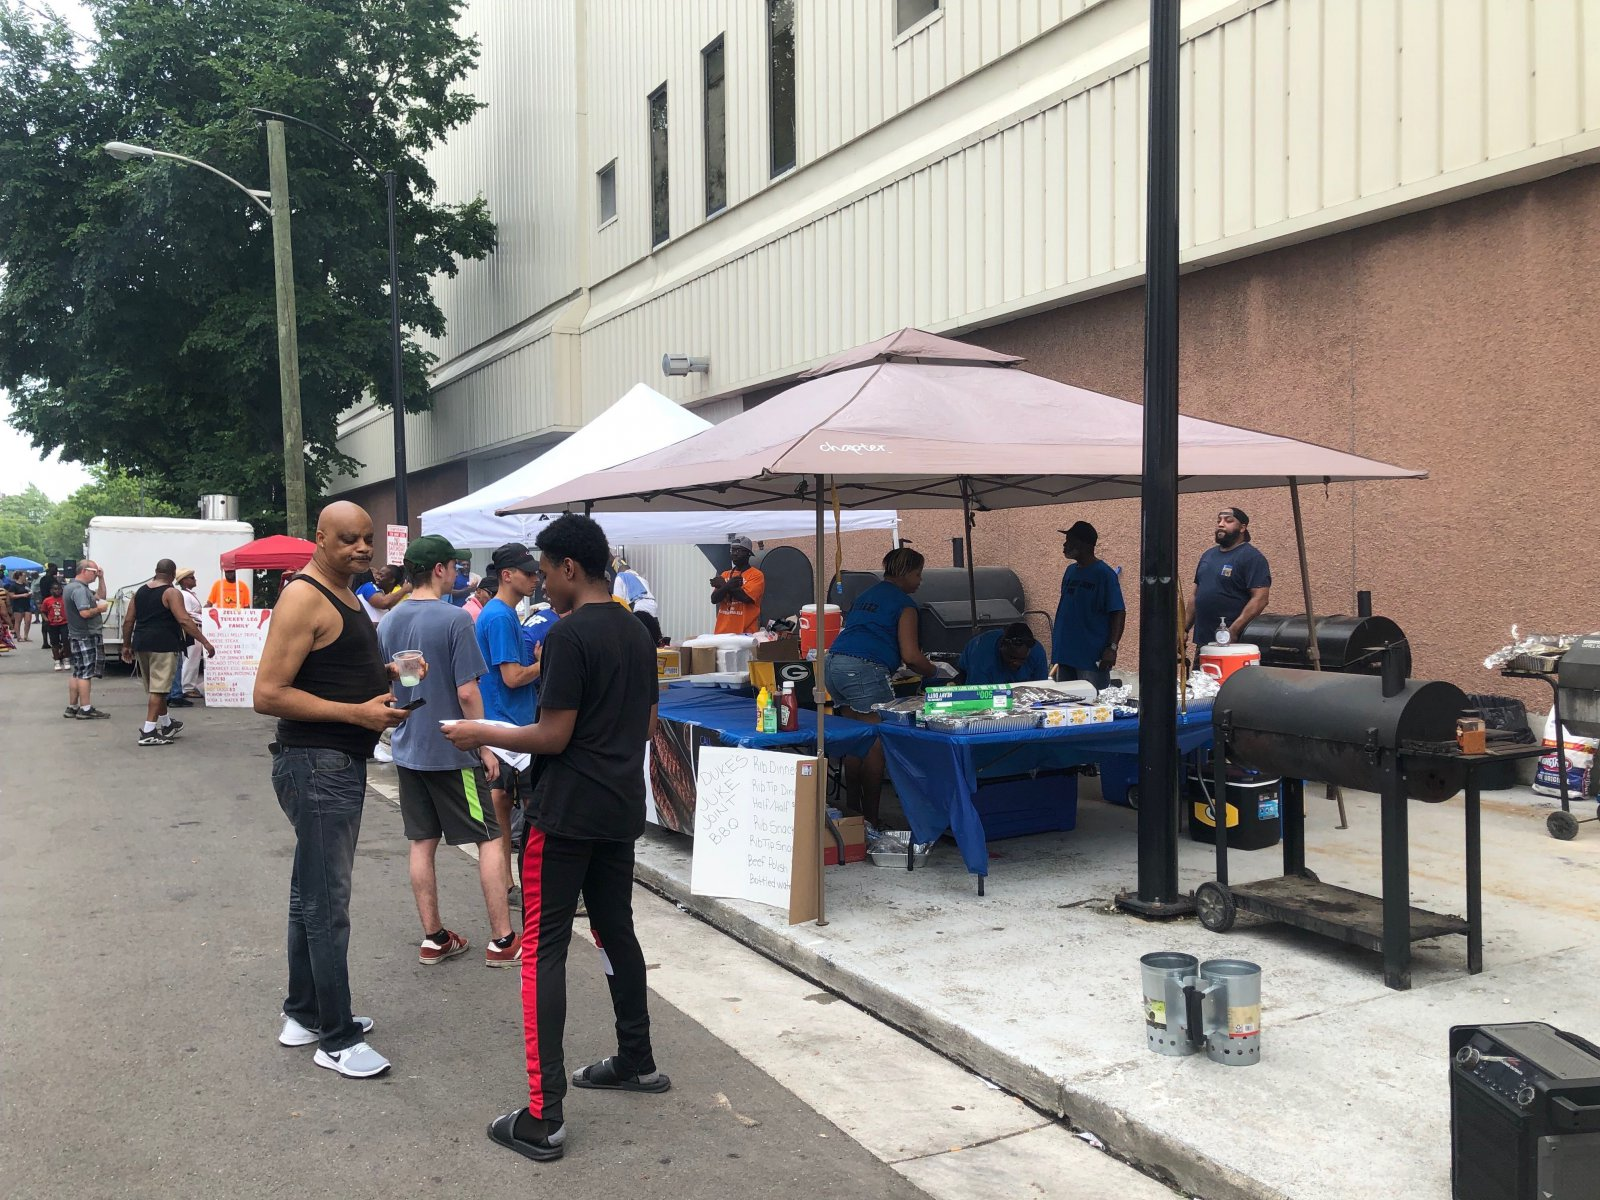 Barbecue Row at Garfield Avenue Festival